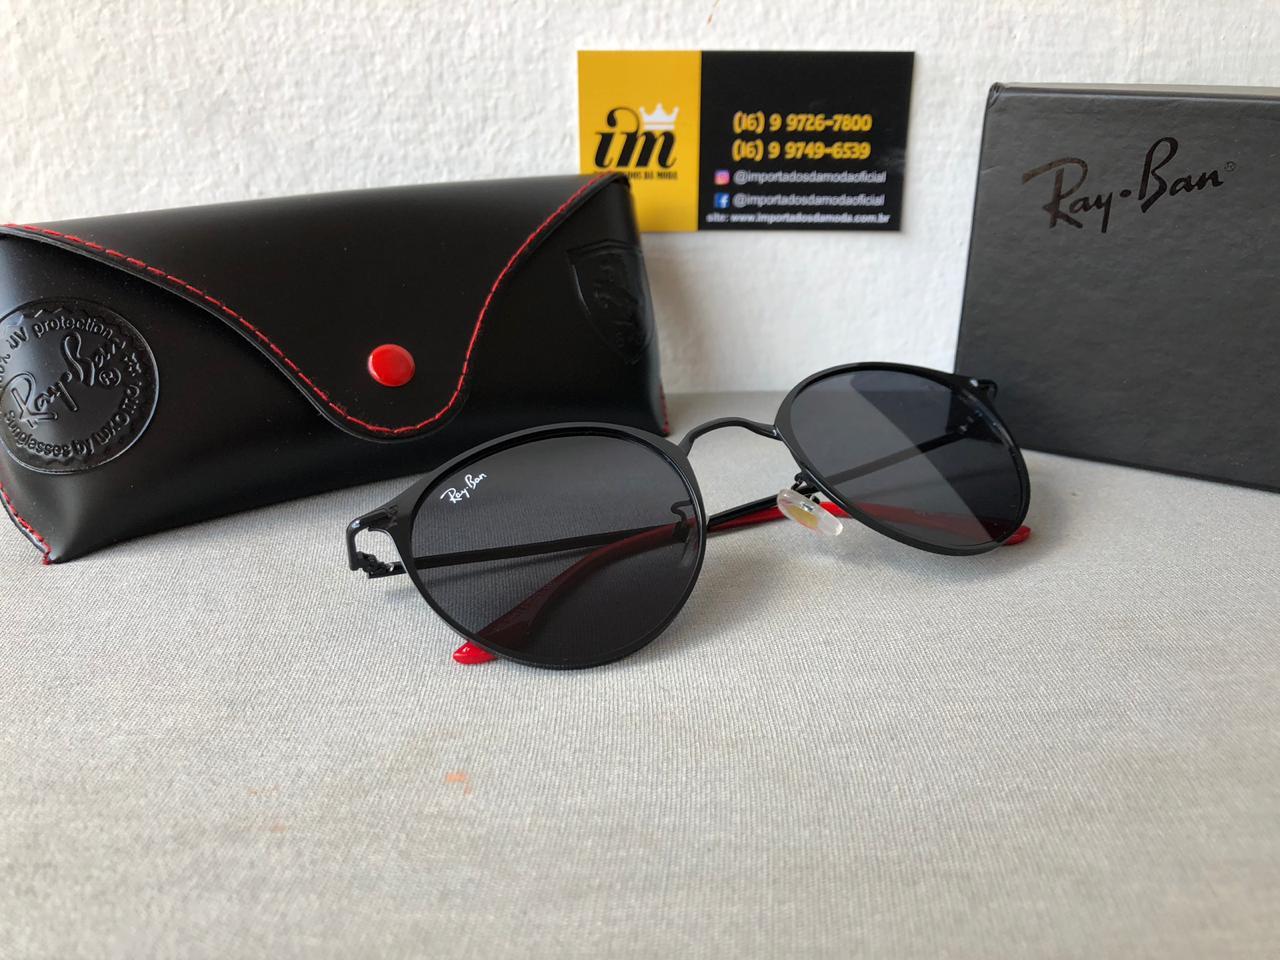 Óculos de Sol Ray Ban Ferrari Réplica Primeira Linha